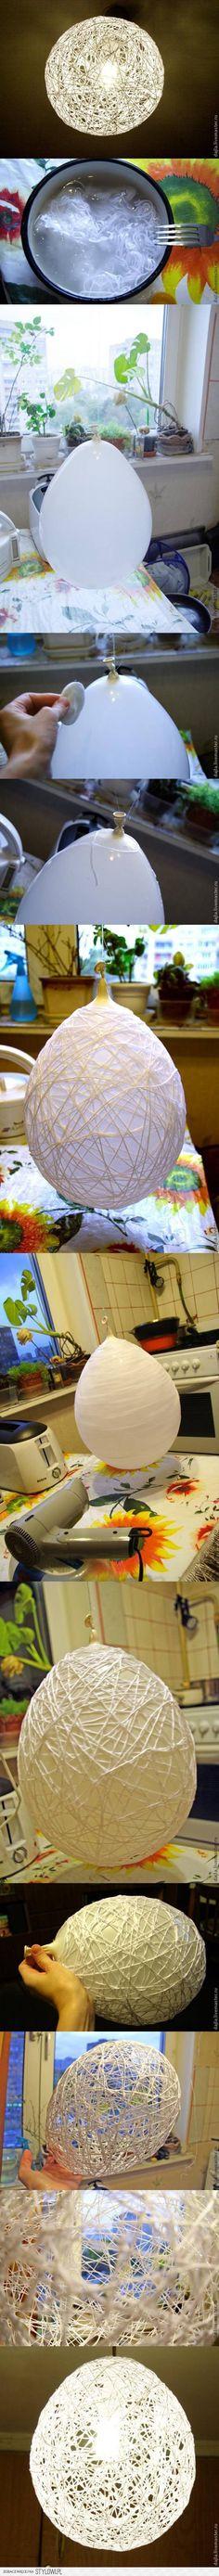 DIY Yarn Made Chandelier DIY Projects | UsefulDIY.com na Stylowi.pl